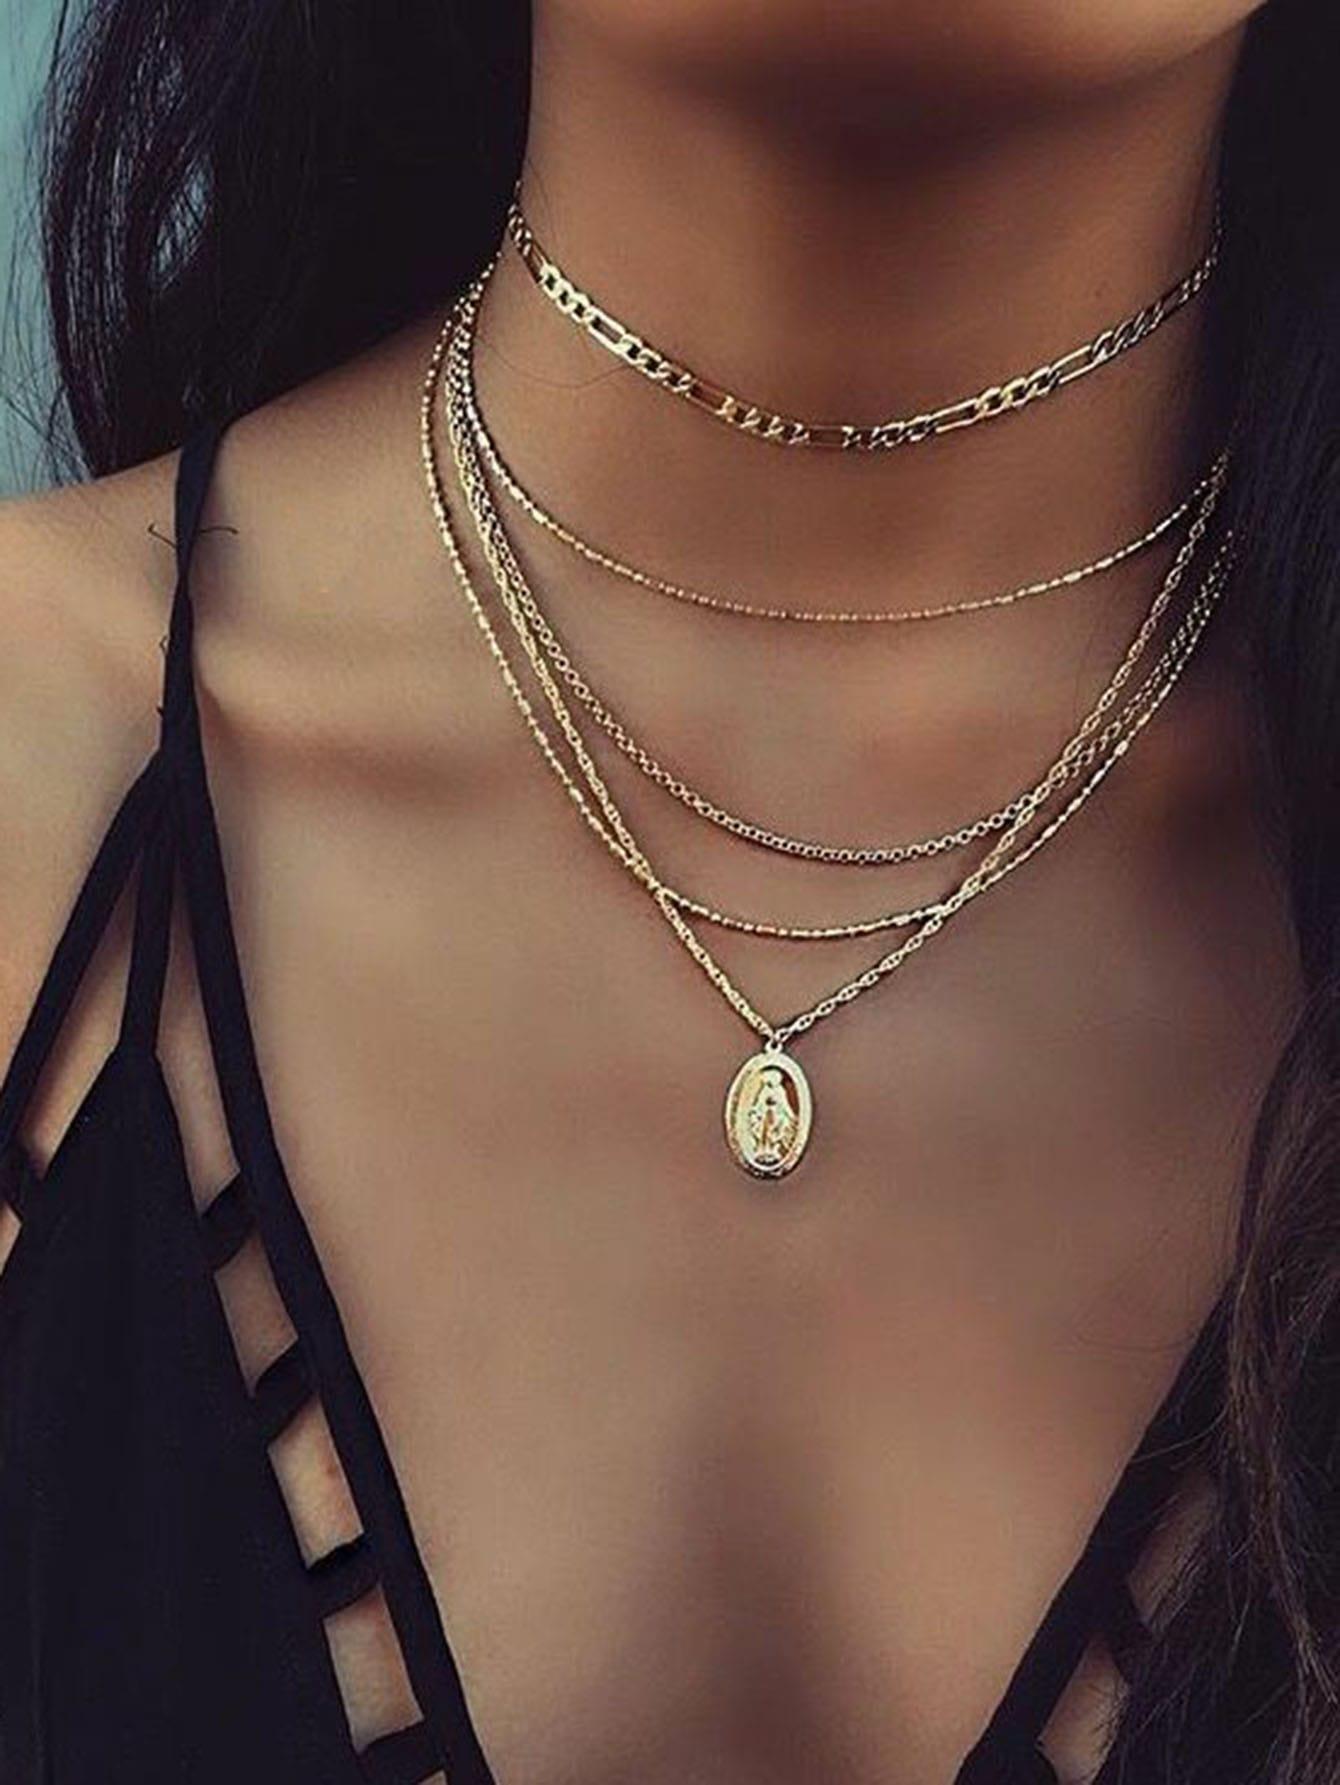 Metall Anhänger geschichteten Kette Halskette